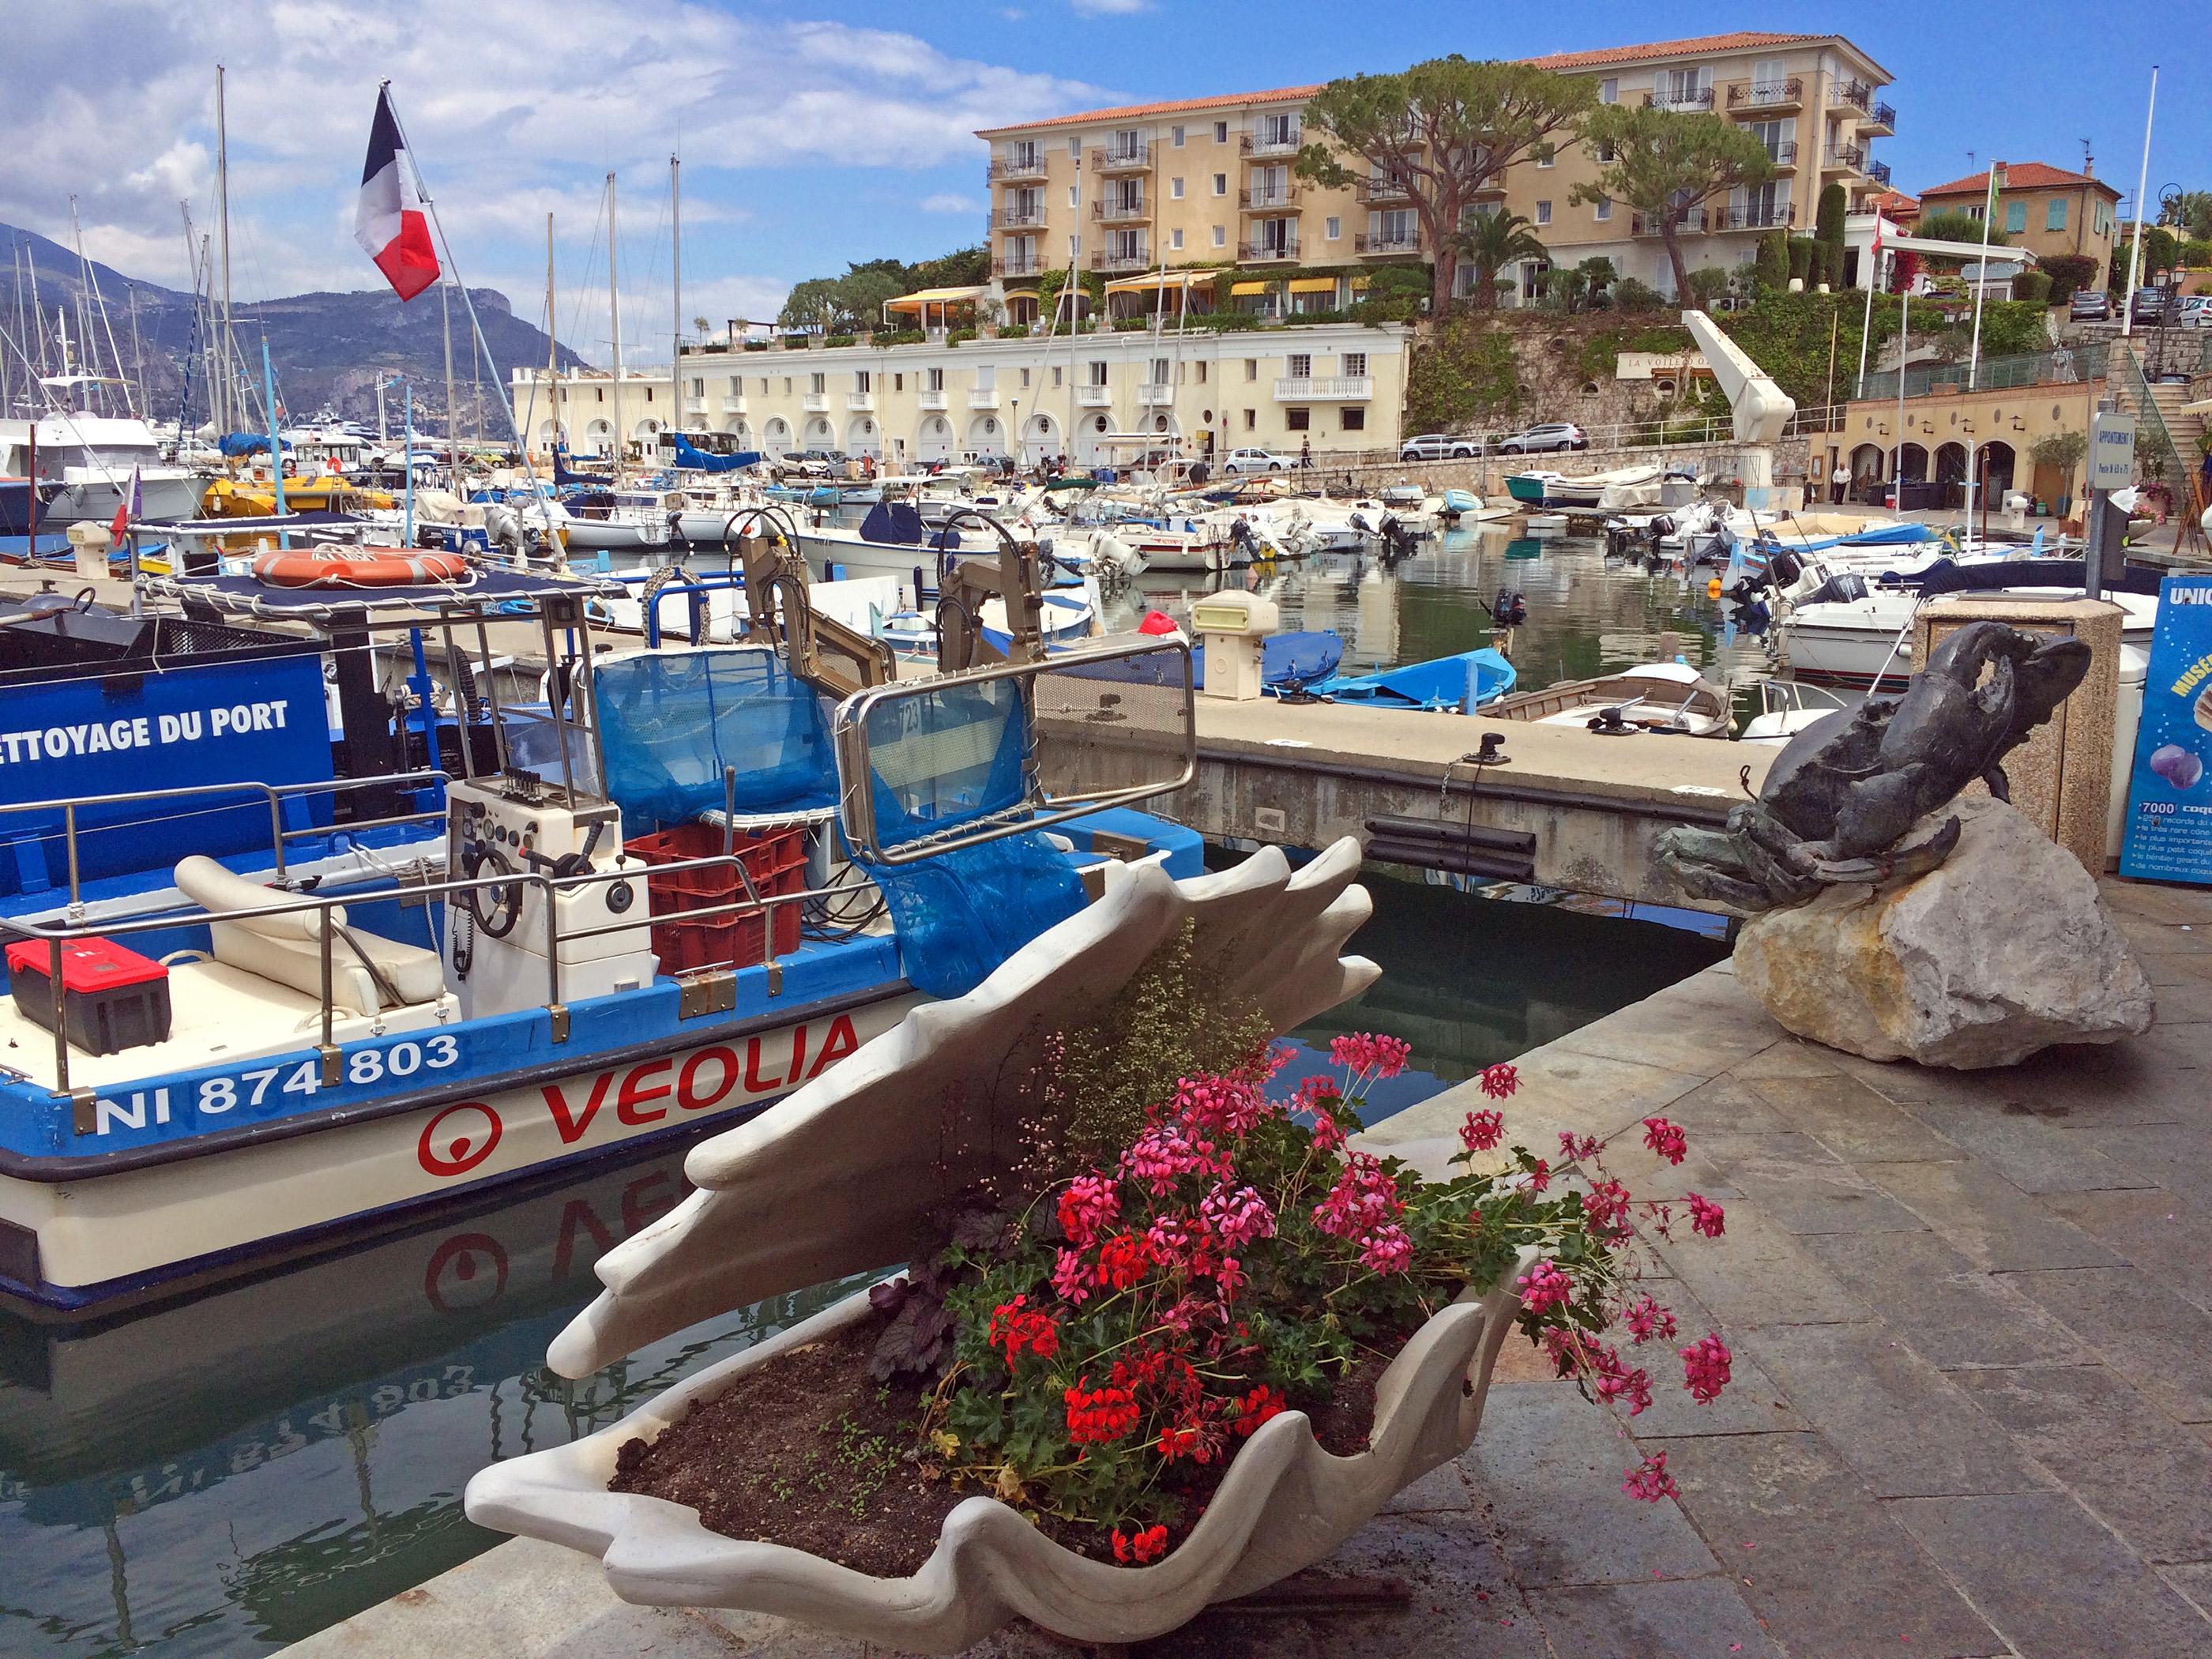 Photos of 2015 page 13 french south and monaco - Port saint jean cap ferrat ...